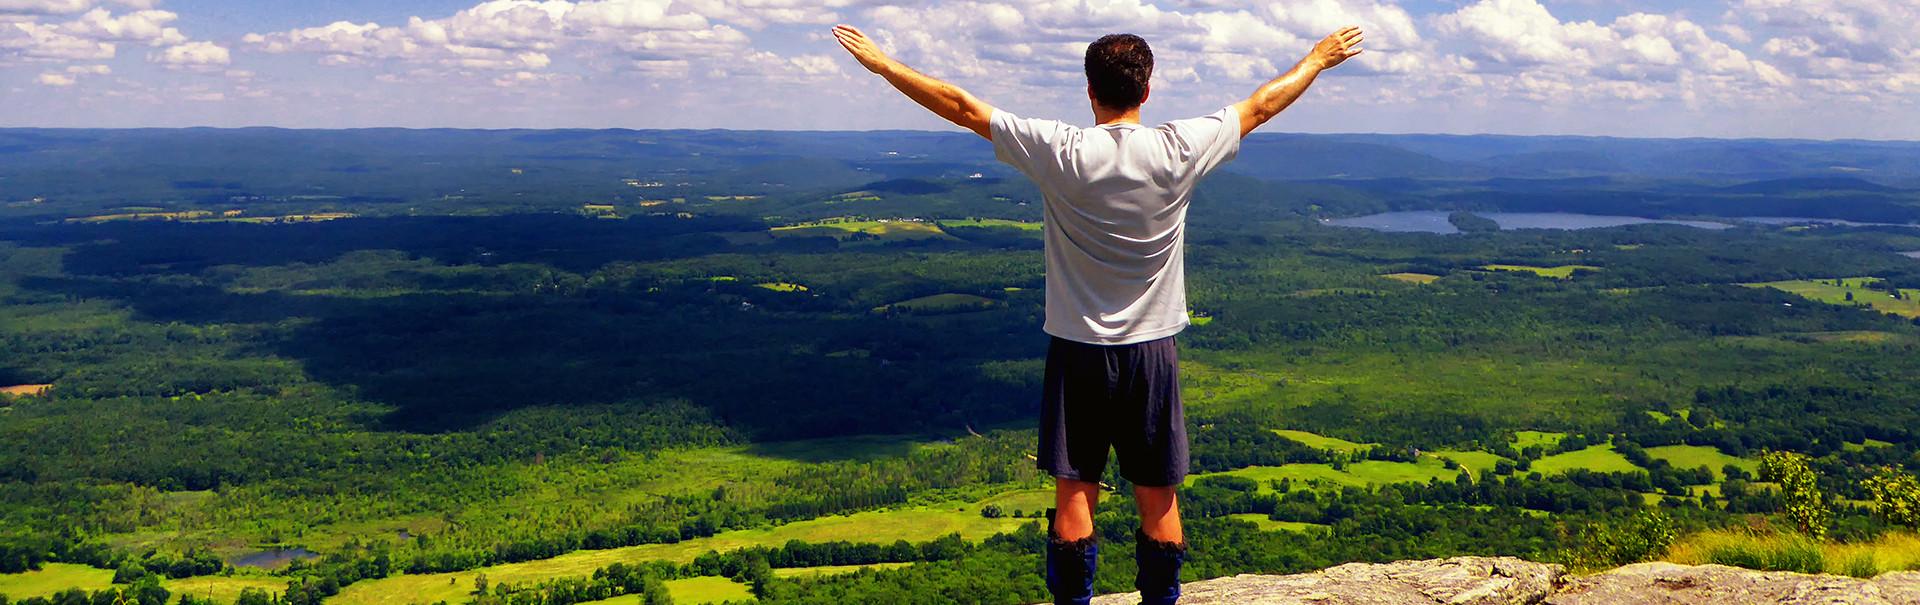 Educatius-WorcesterAcademy-Massachusetts-Boarding-hiking-Banner-2019